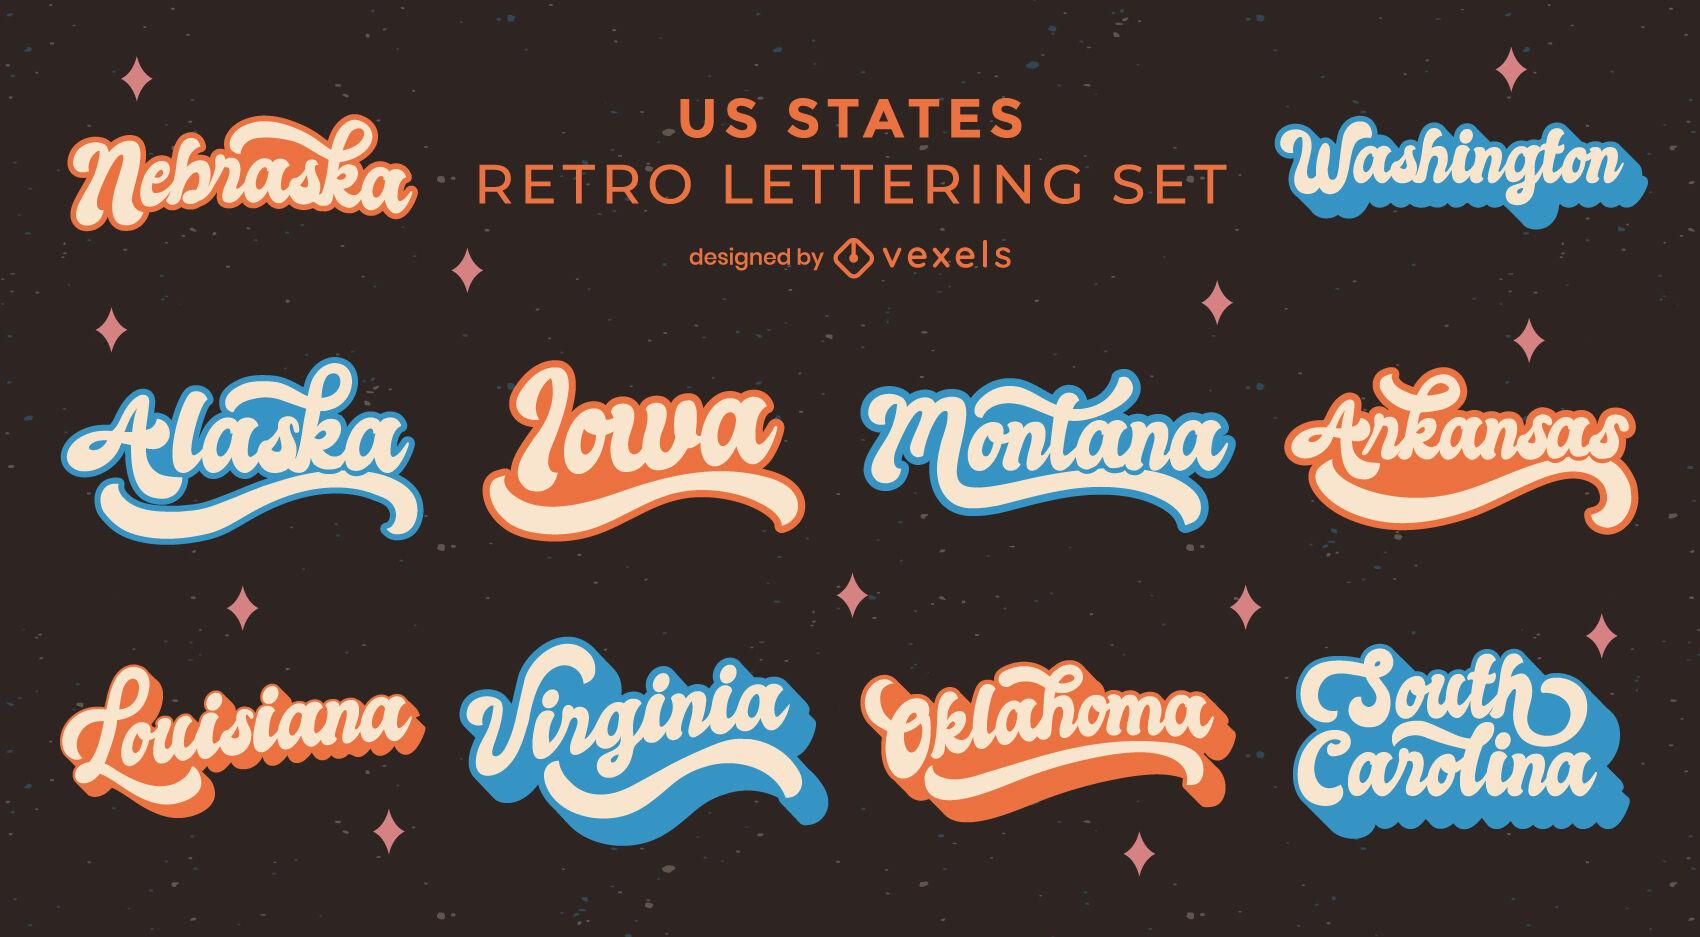 US states retro lettering set